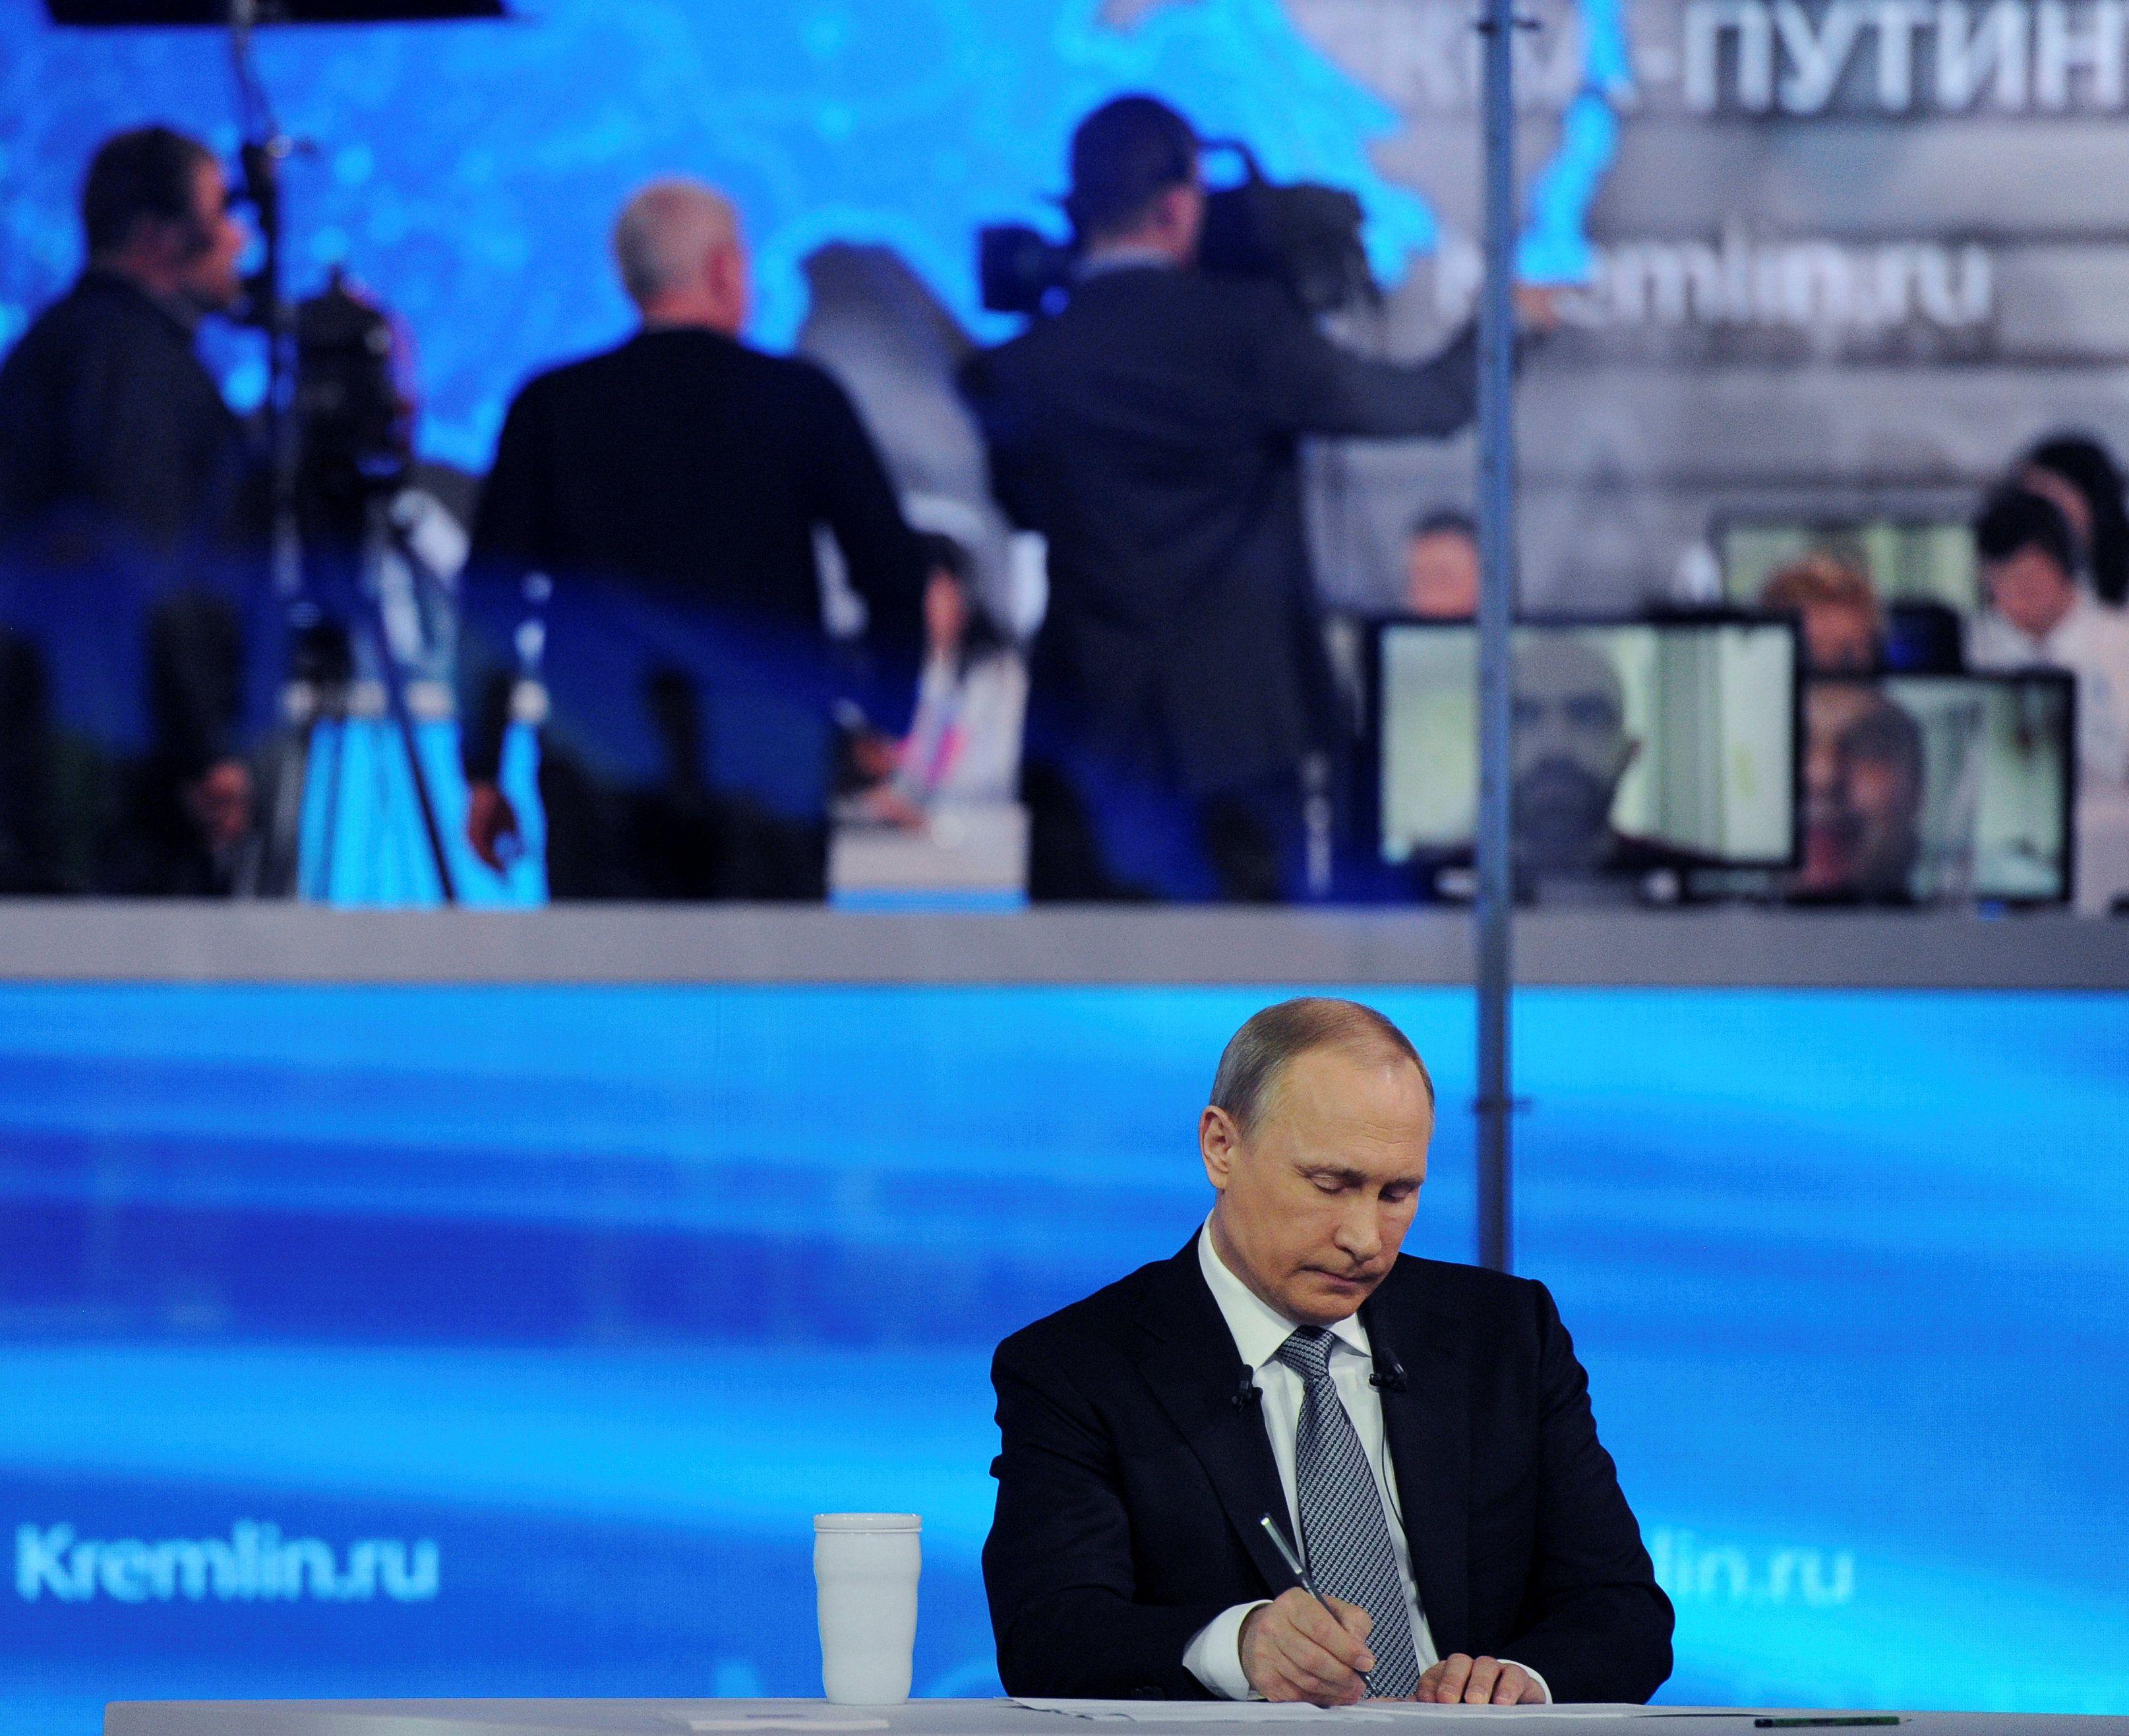 Брат Немцова троллит прямую линию Путина